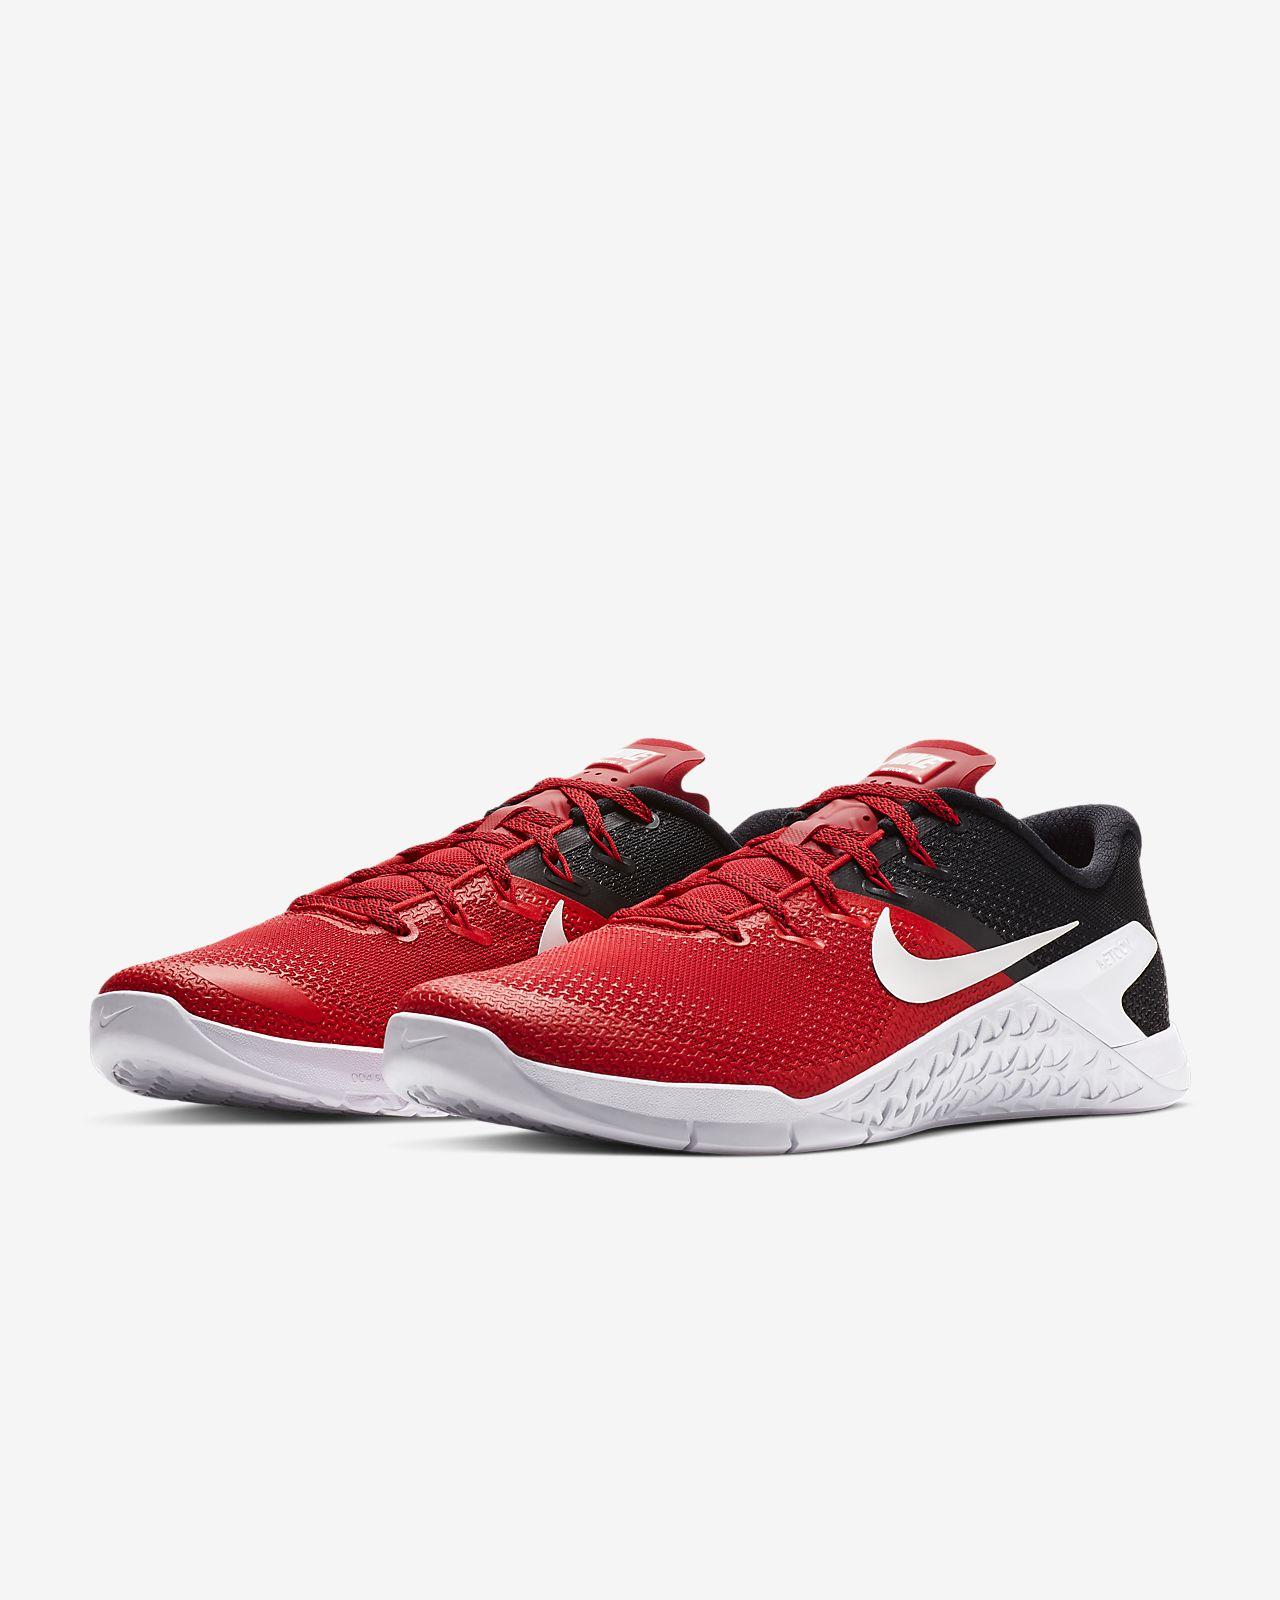 04fe563553 ... Sapatilhas de treino multidisciplinar halterofilismo Nike Metcon 4 para  homem